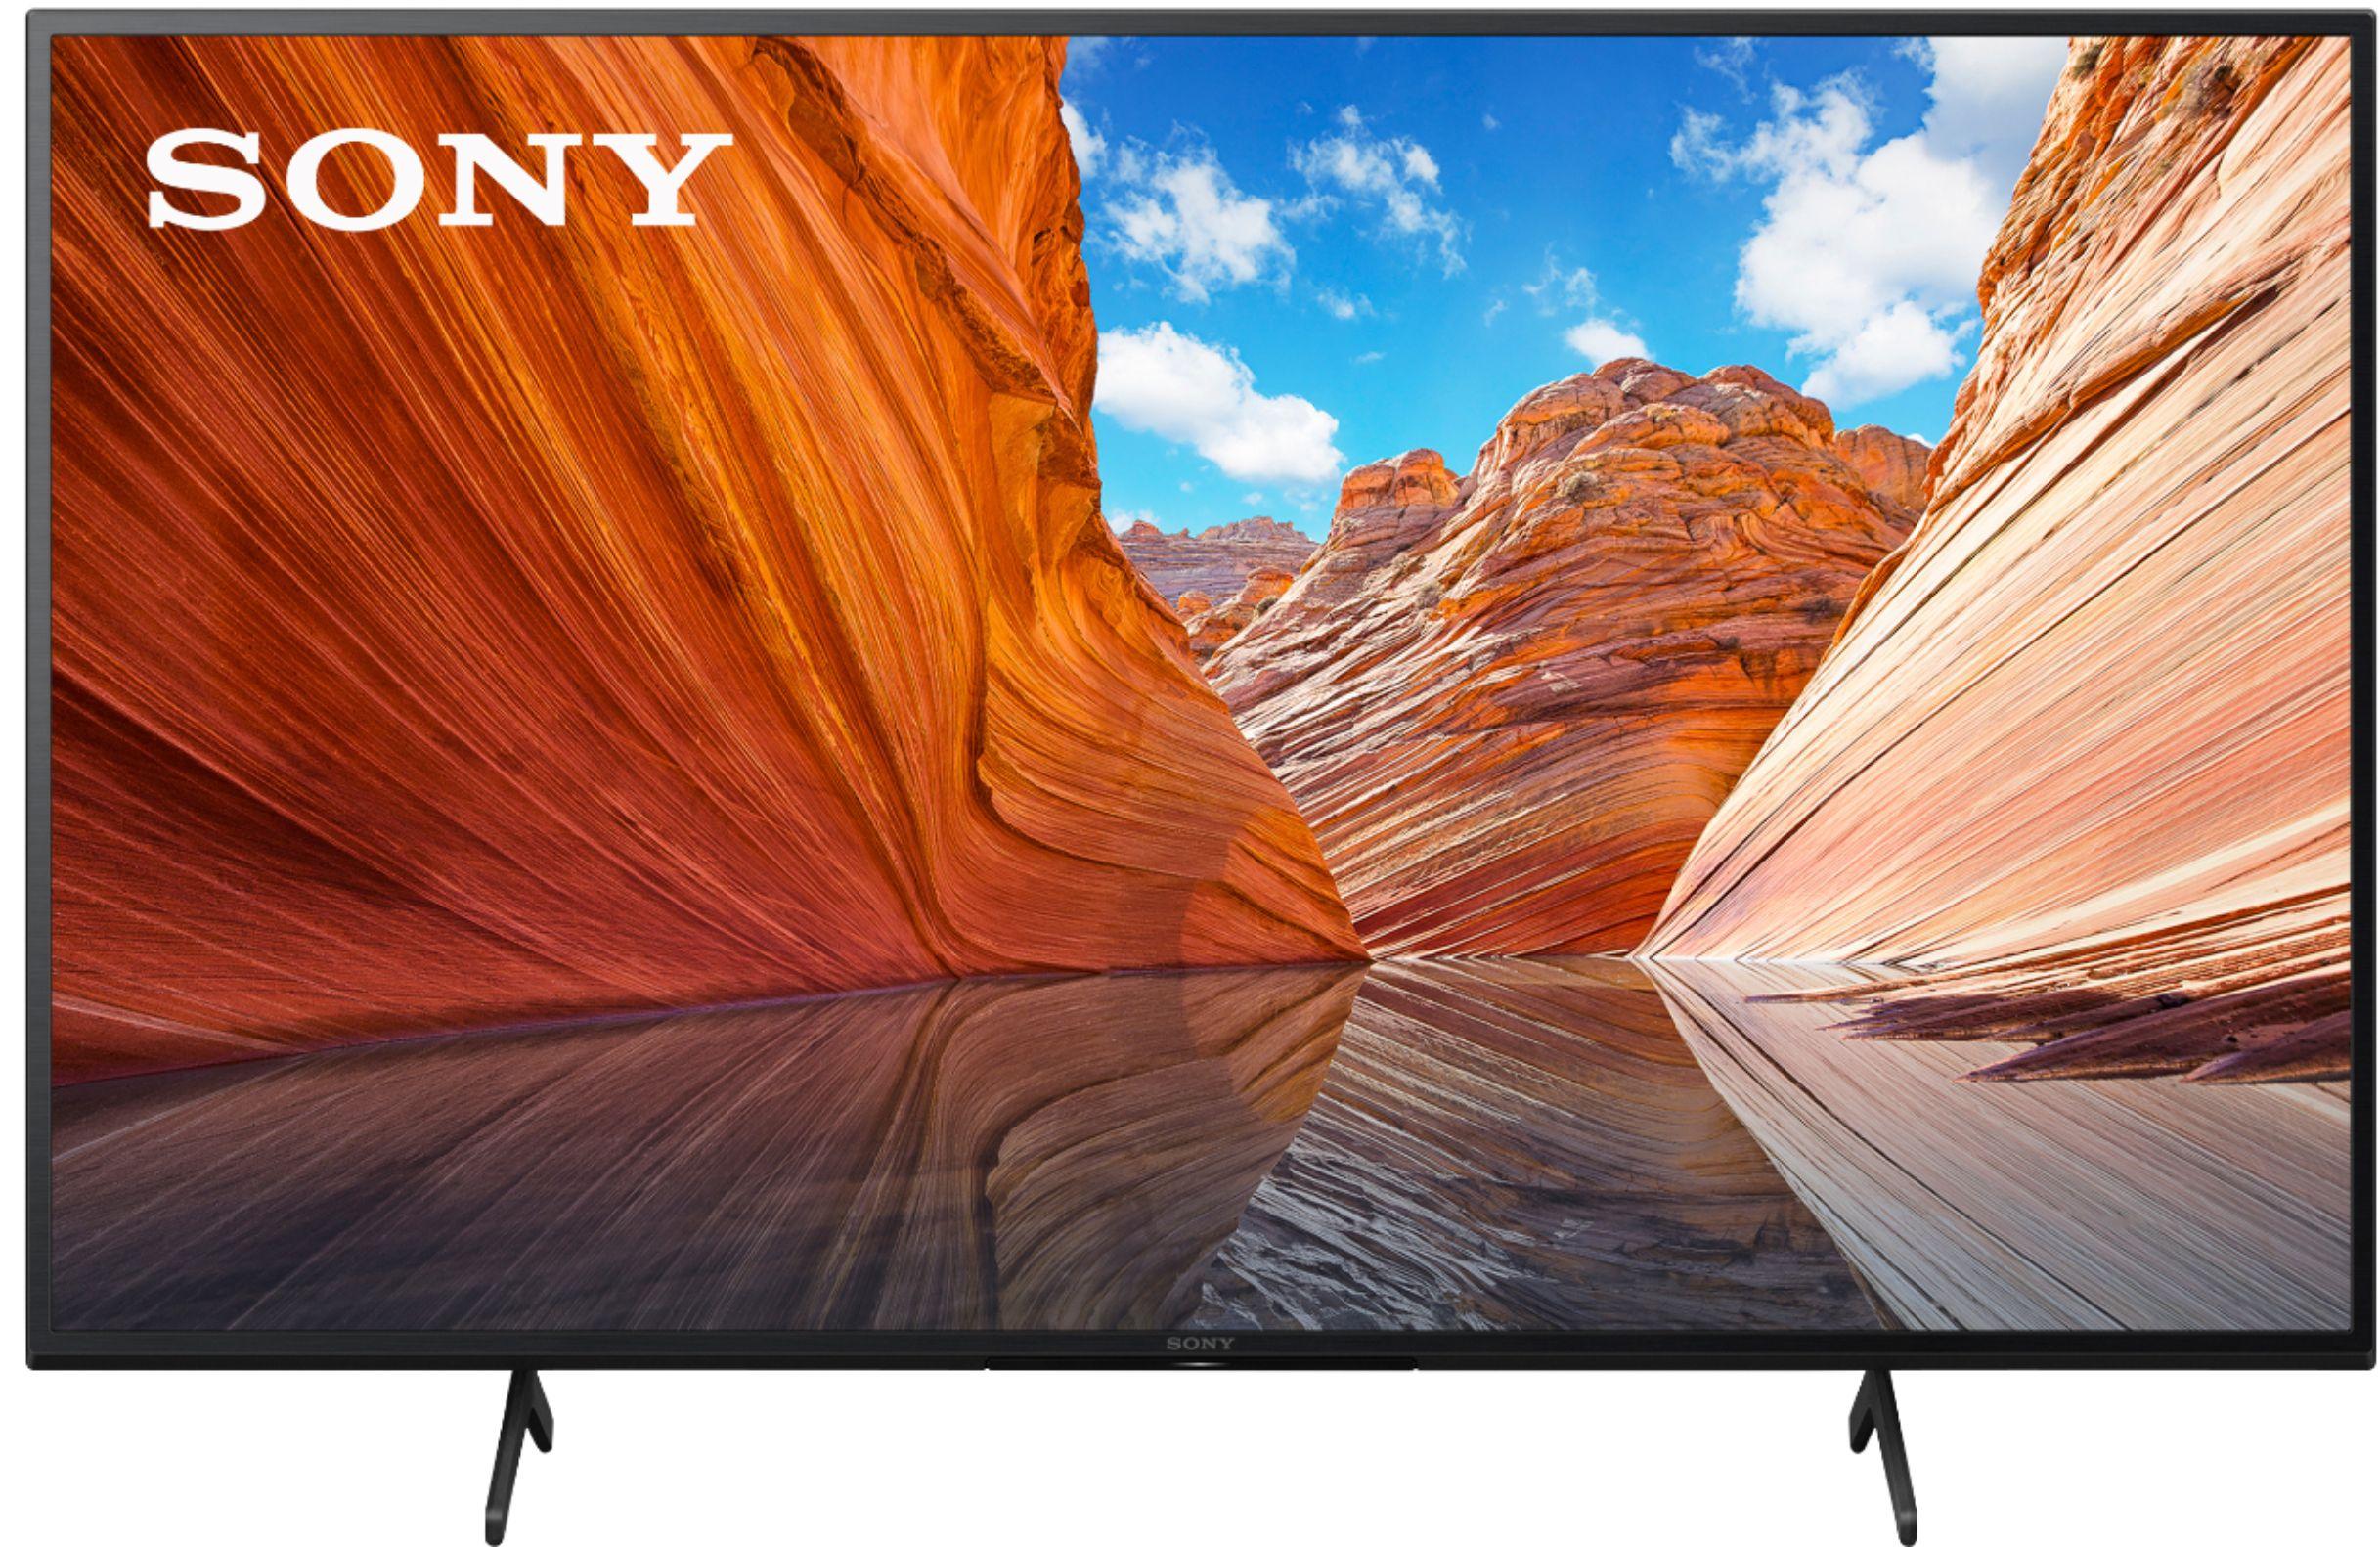 "Sony - 43"" Class X80J Series LED $549 + FS at Best Buy"